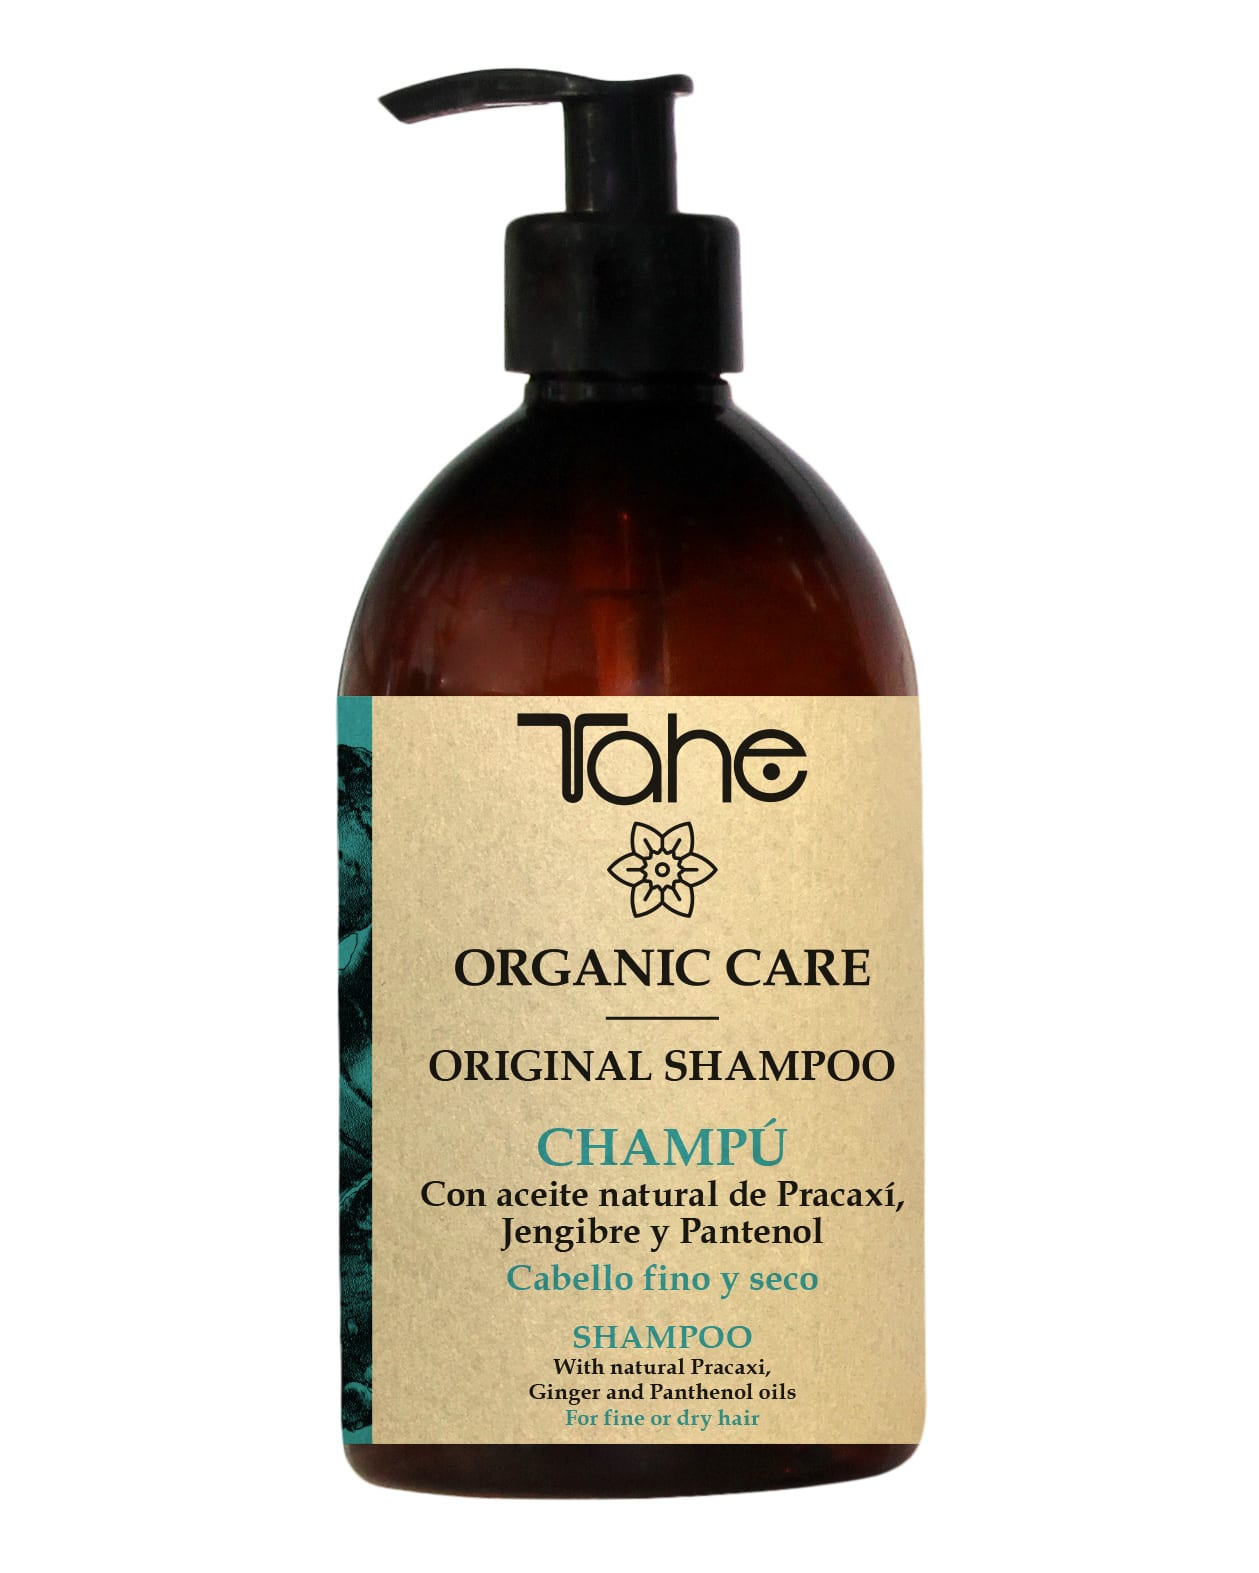 Tahe Organic Care Shampooing Original Oil cheveux fins et secs 500ml